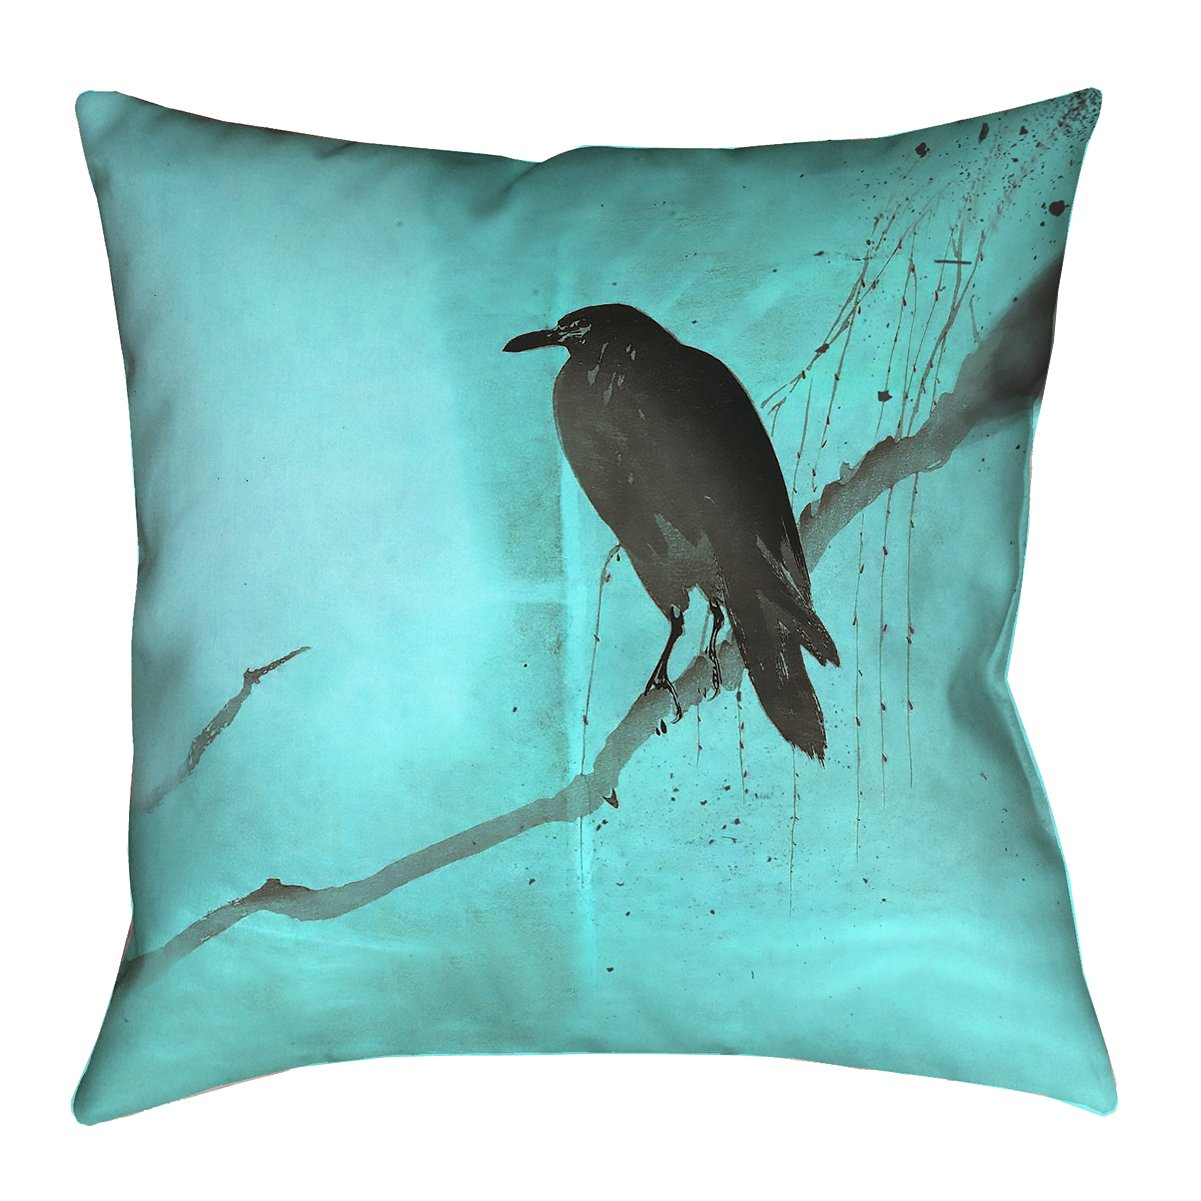 ArtVerse Katelyn Smith 20 x 20 Spun Polyester Red Crow and Willow Pillow